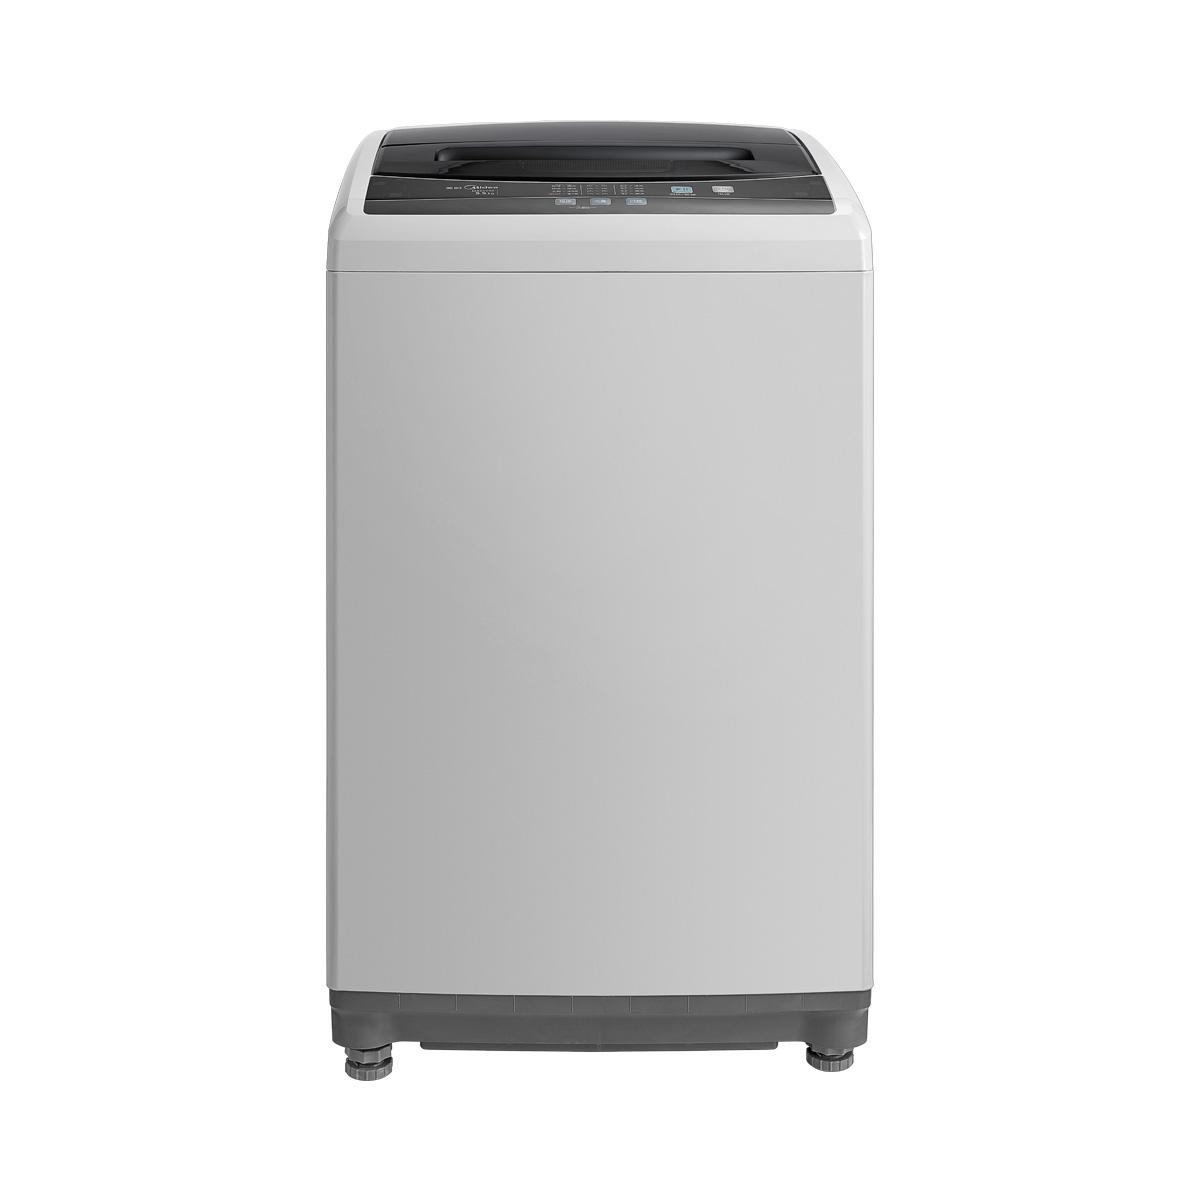 Midea/美的 MB55V30洗衣机 说明书.pdf